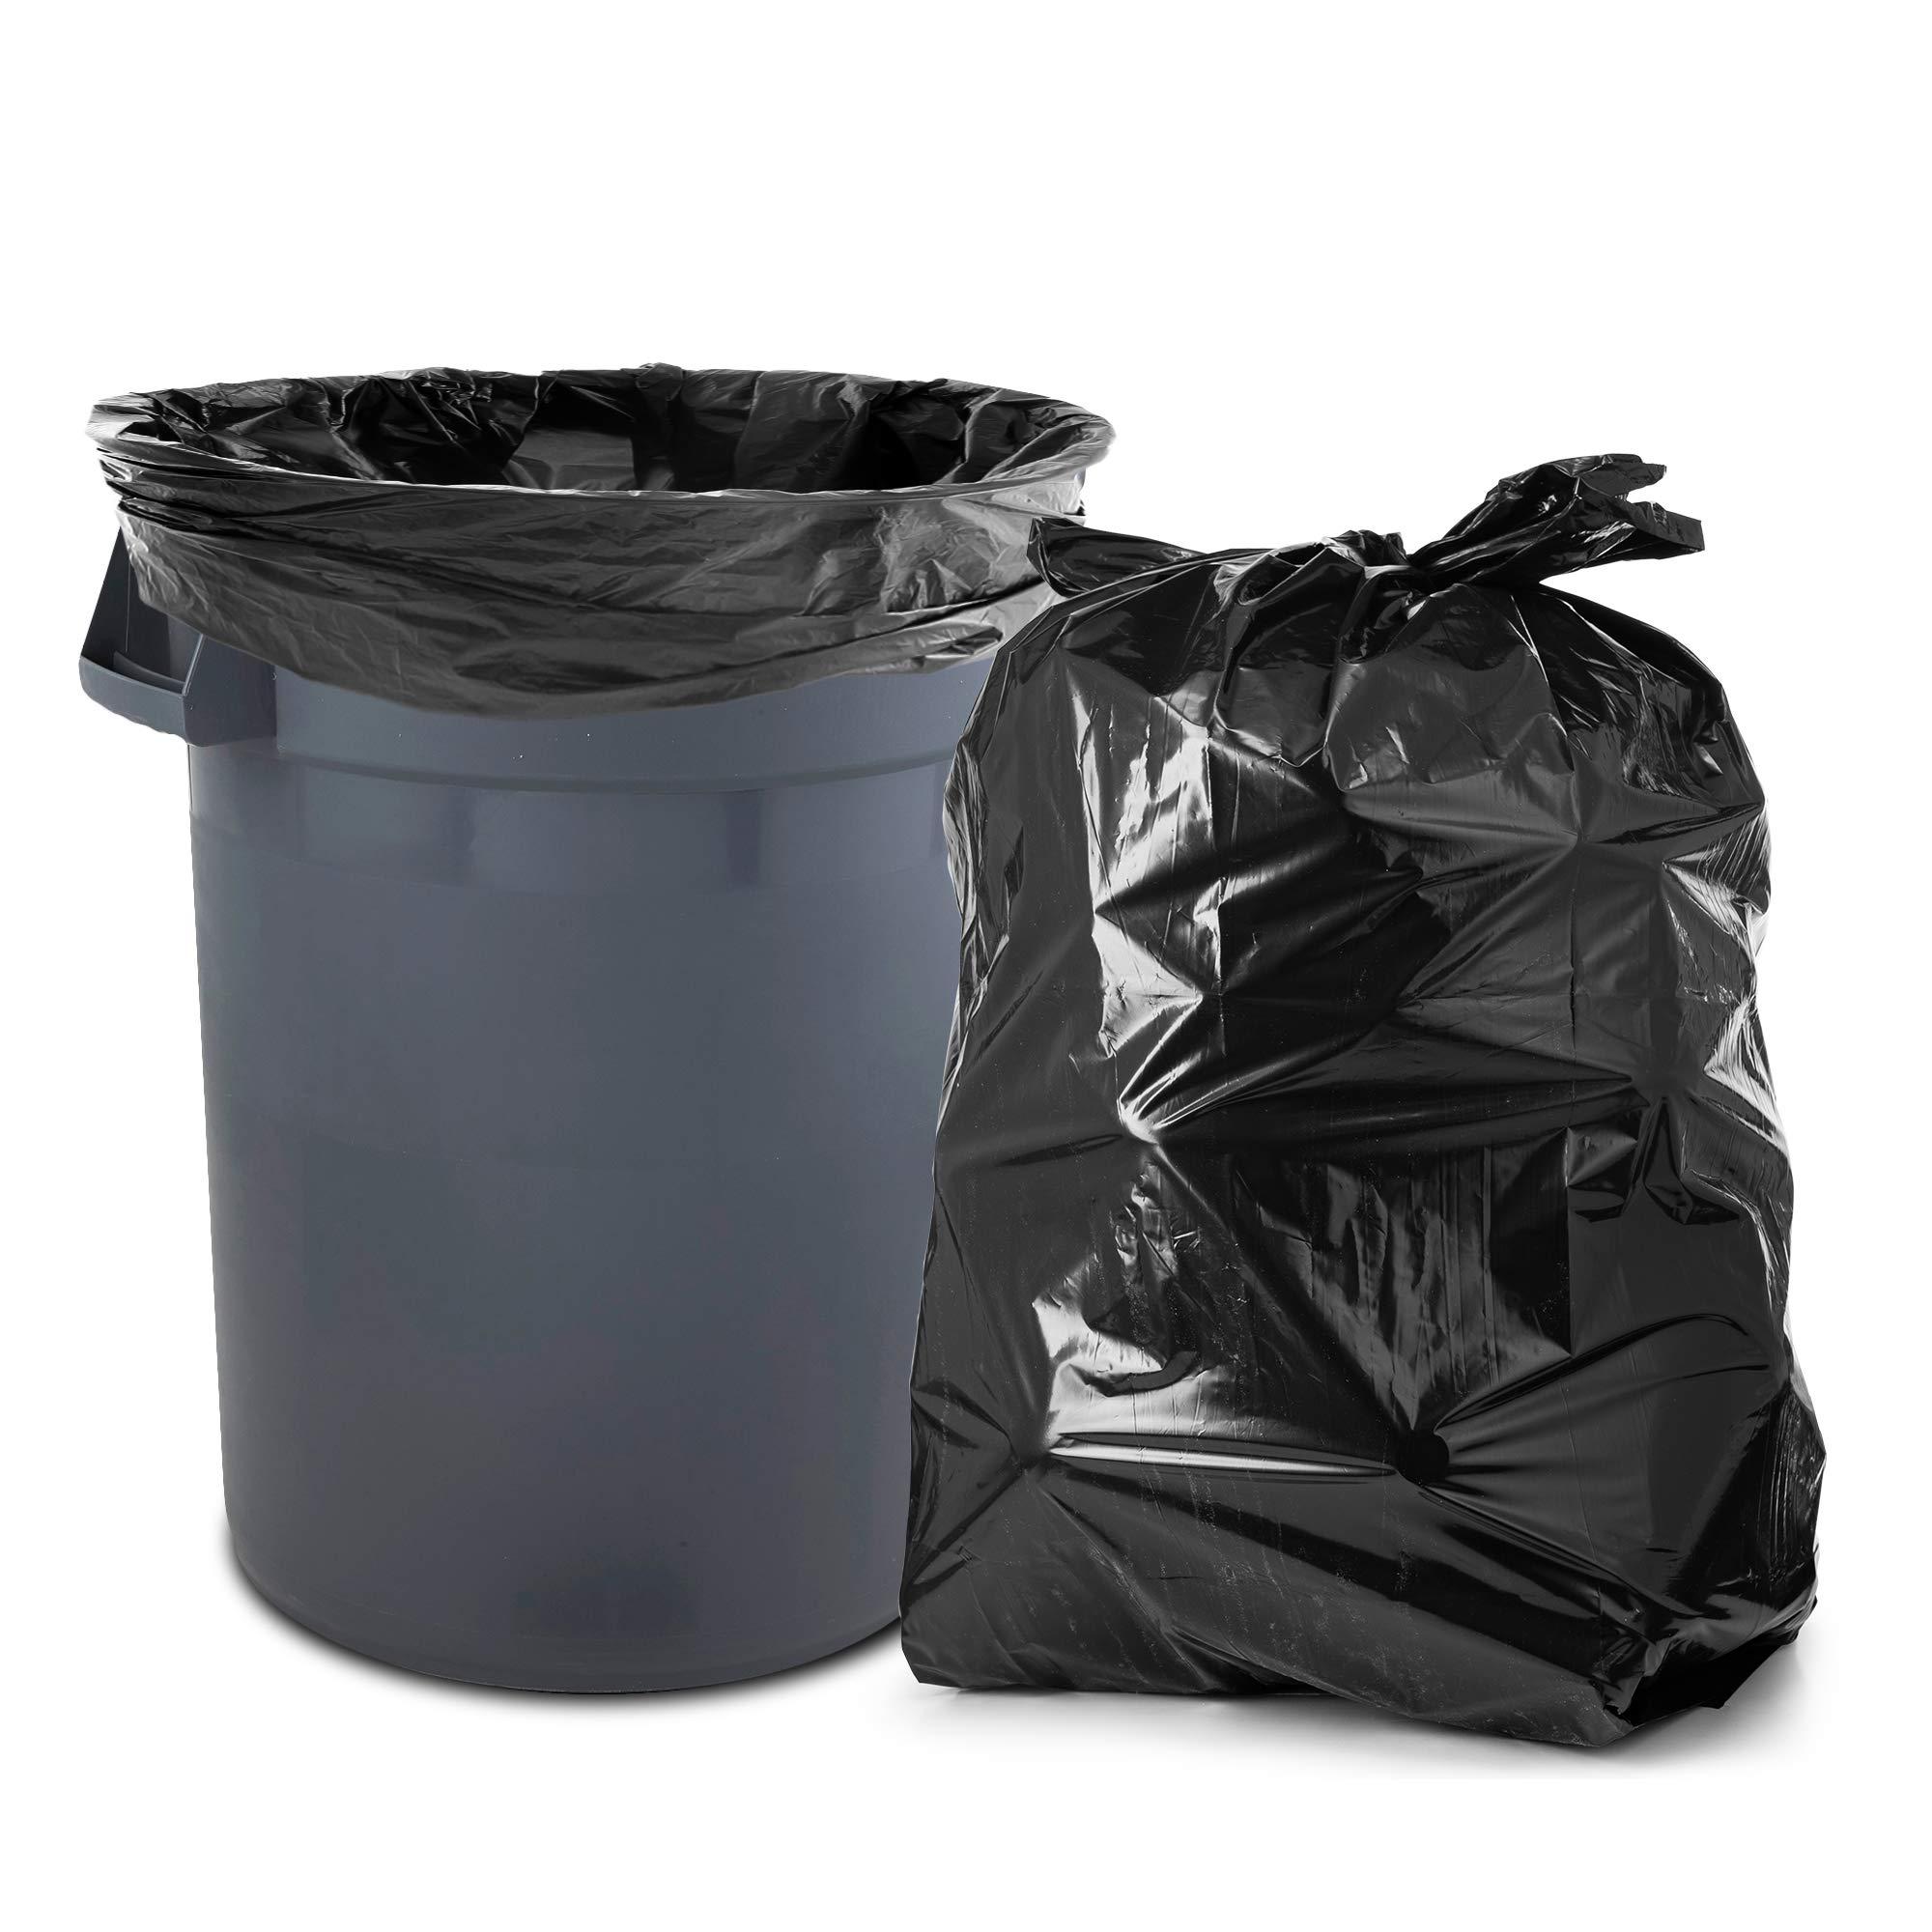 Tasker Rubbermaid Compatible 44 Gallon Trash Bags, Large Black Garbage Bags, (100 Case) by Tasker